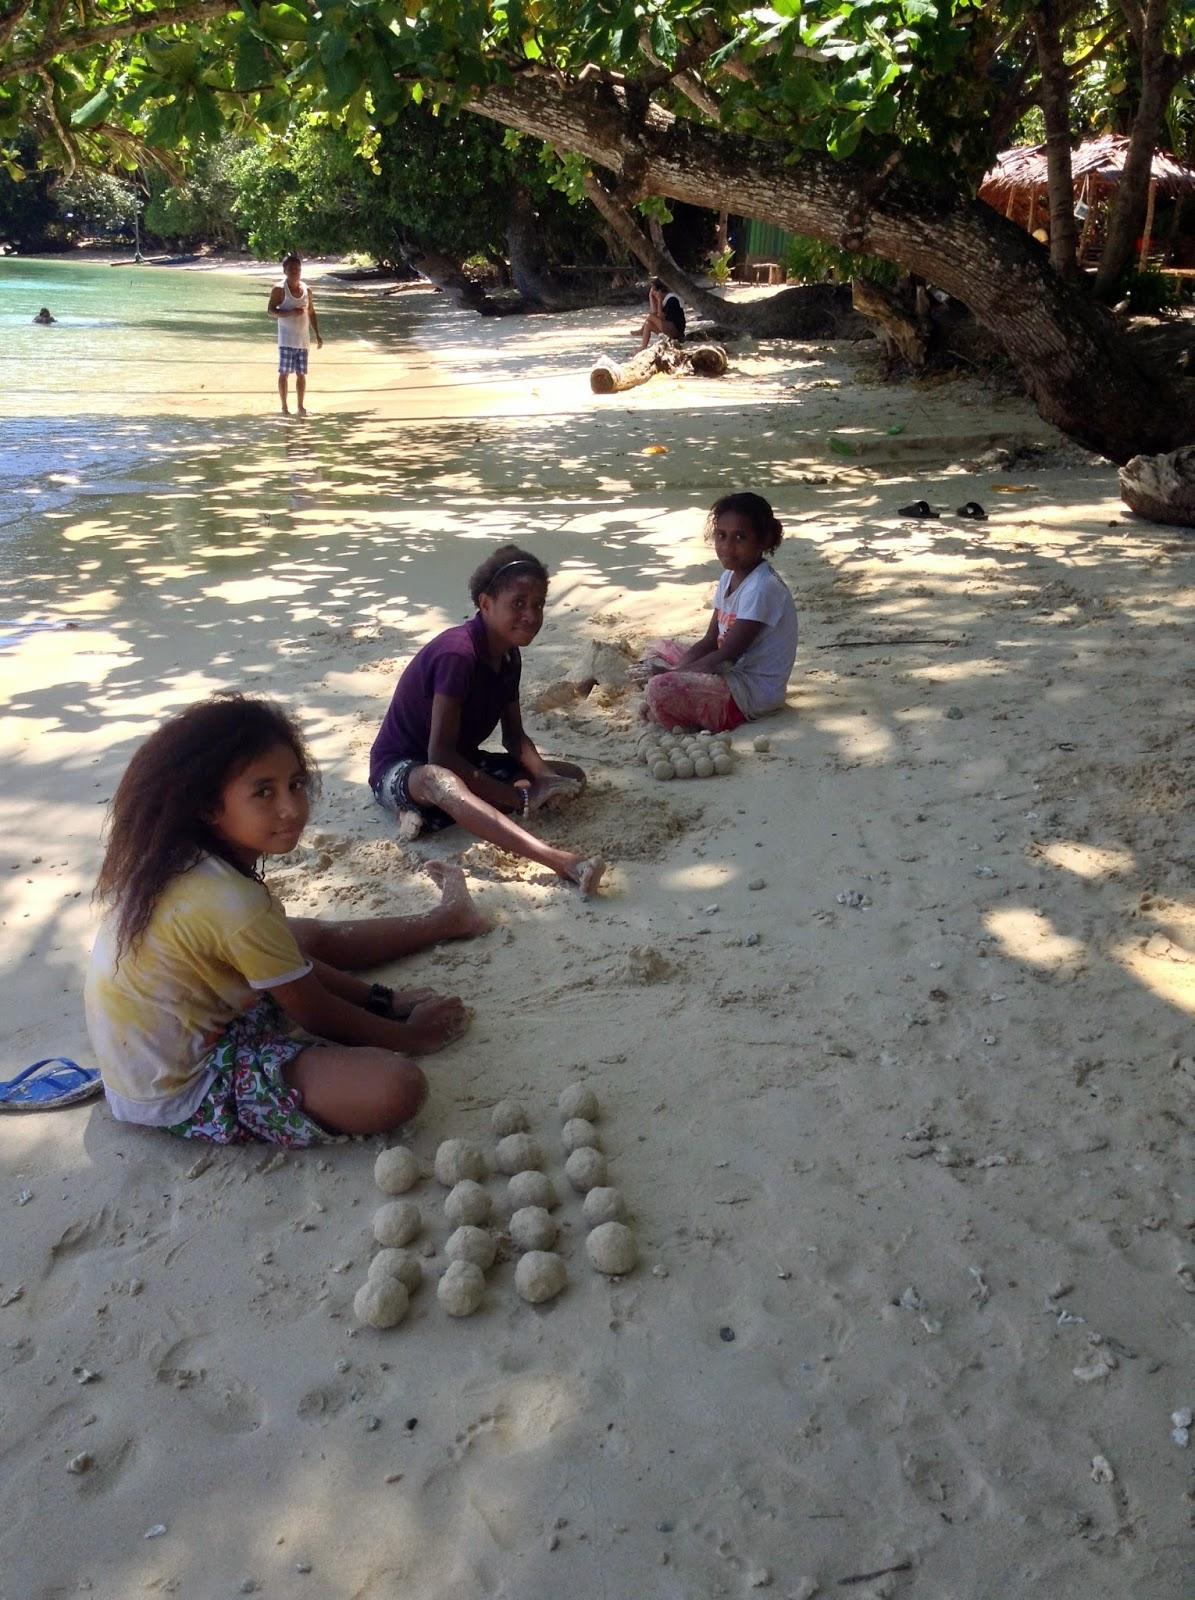 Keindahan Pantai Harlem Nominasi Obyek Wisata Bersih Jayapura Aktivitas Penduduk